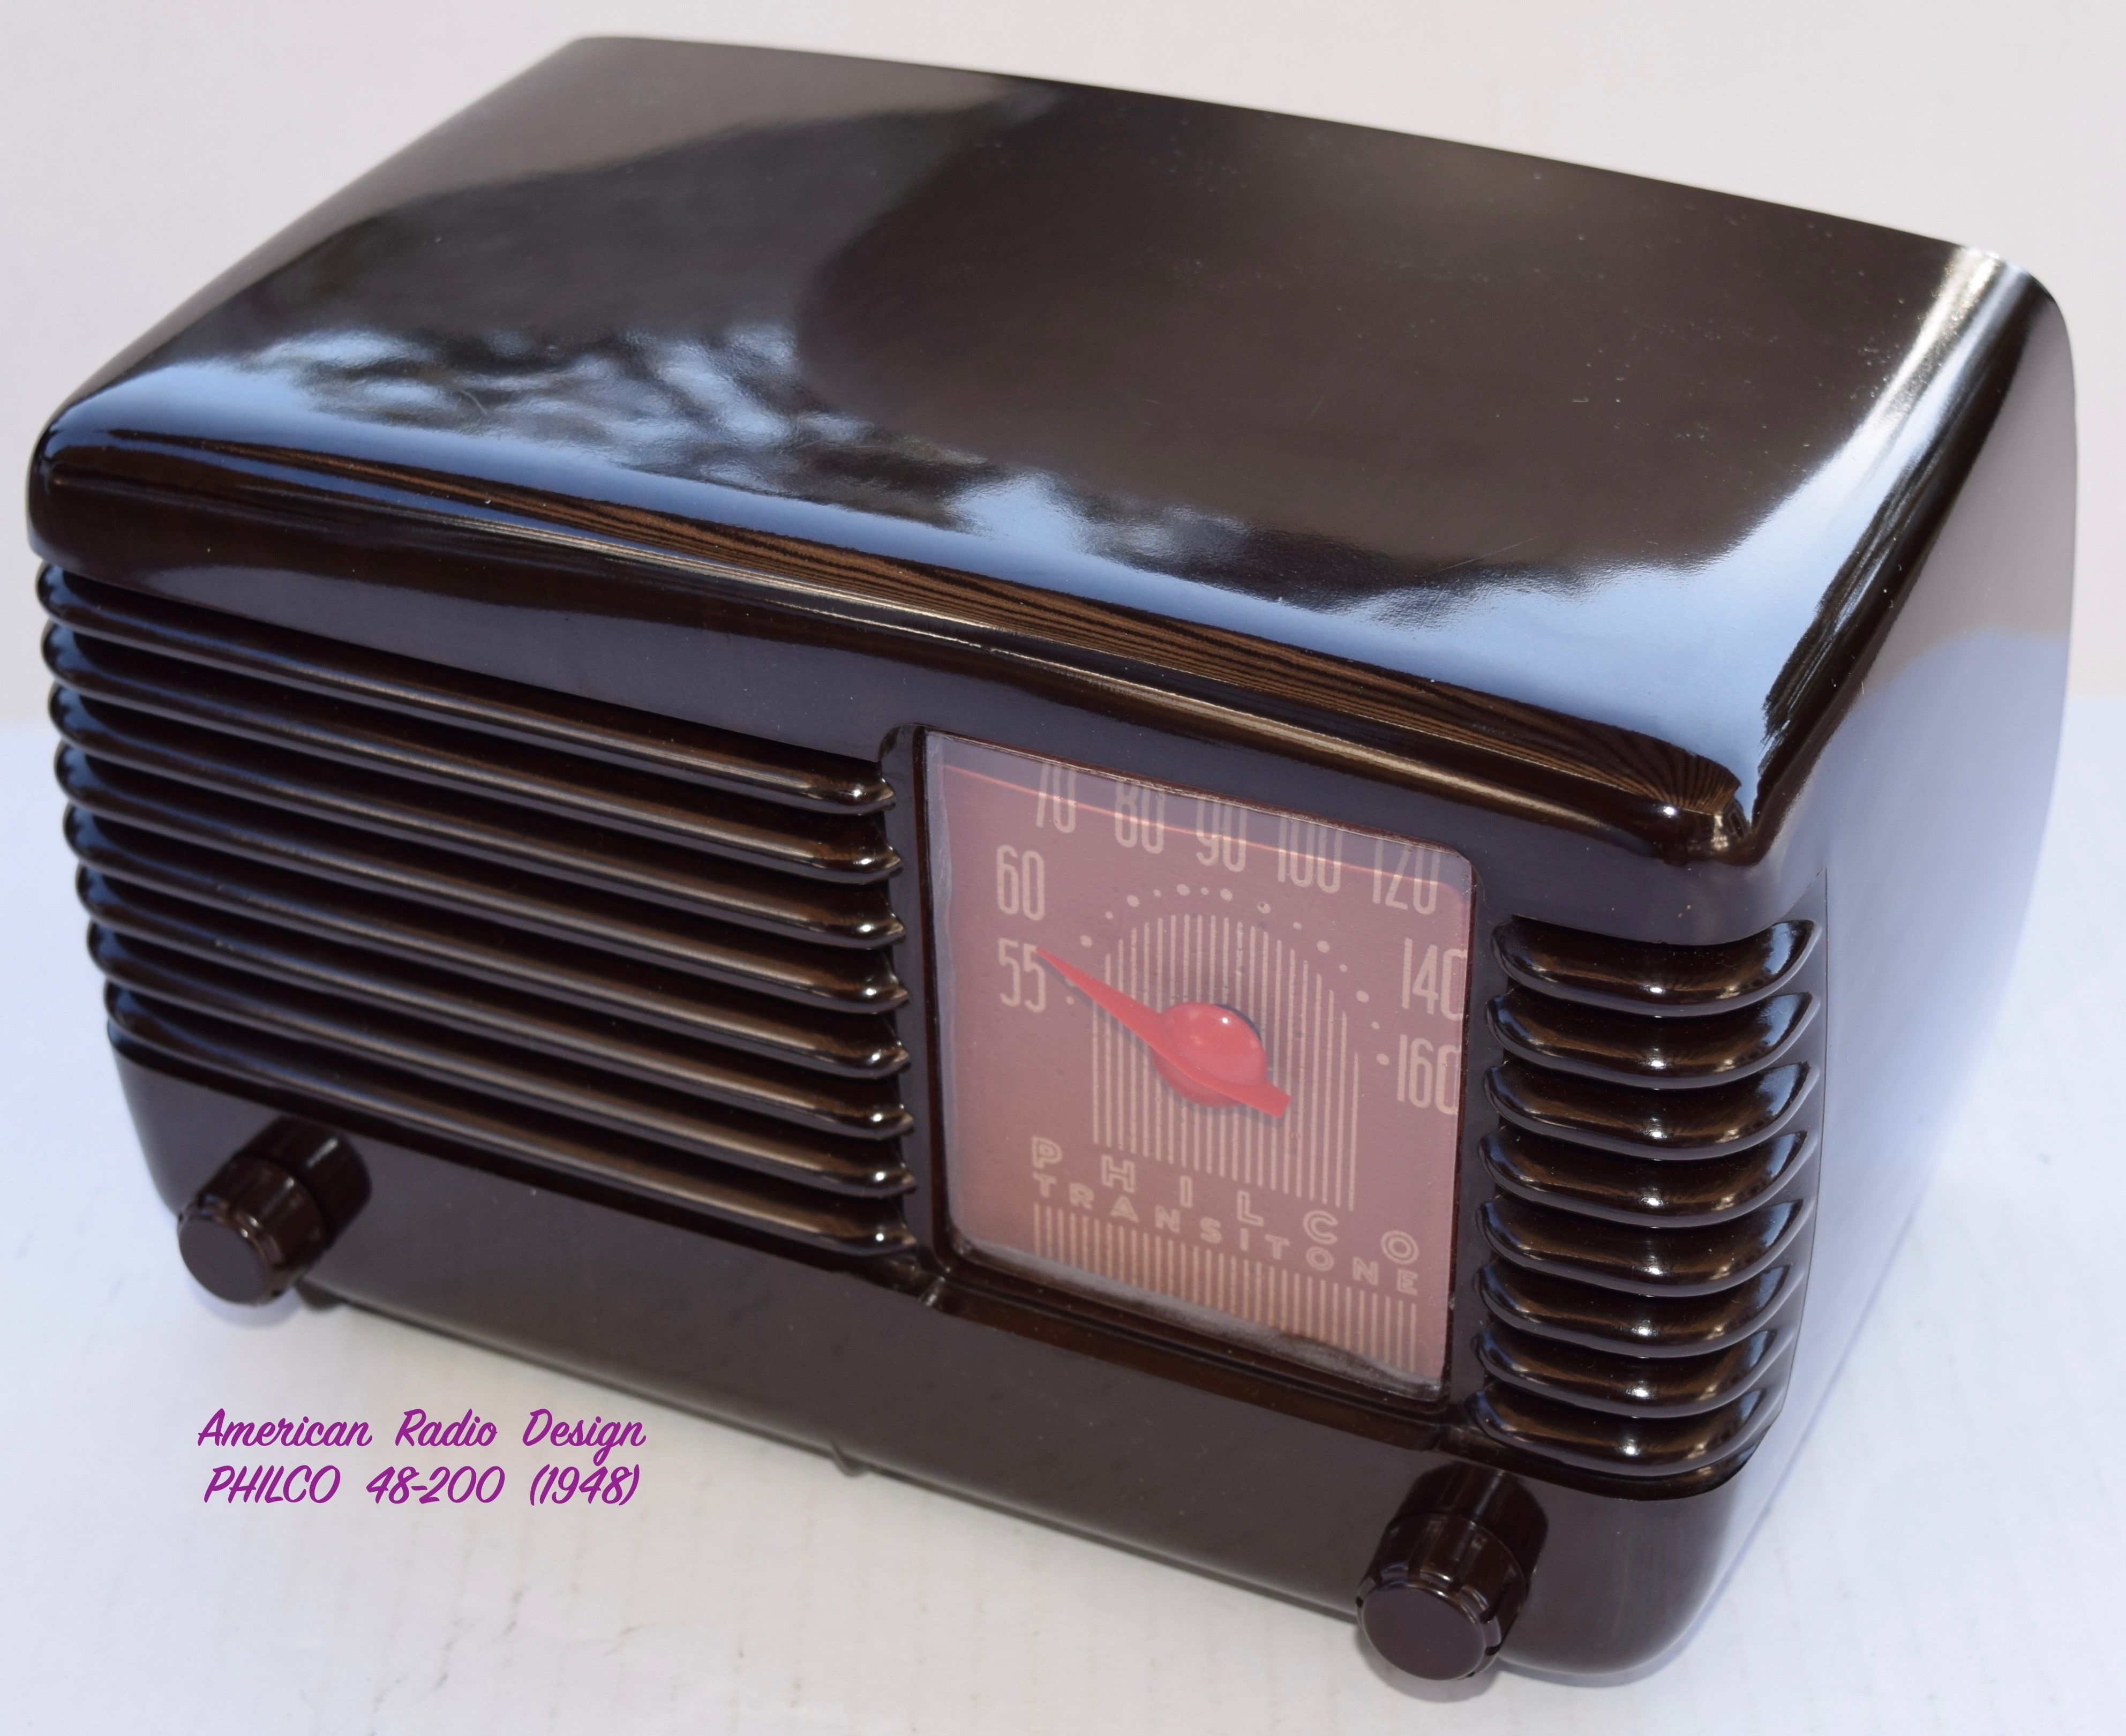 Pin by American Radio Design on Greg Mercurio American Radio Design ...